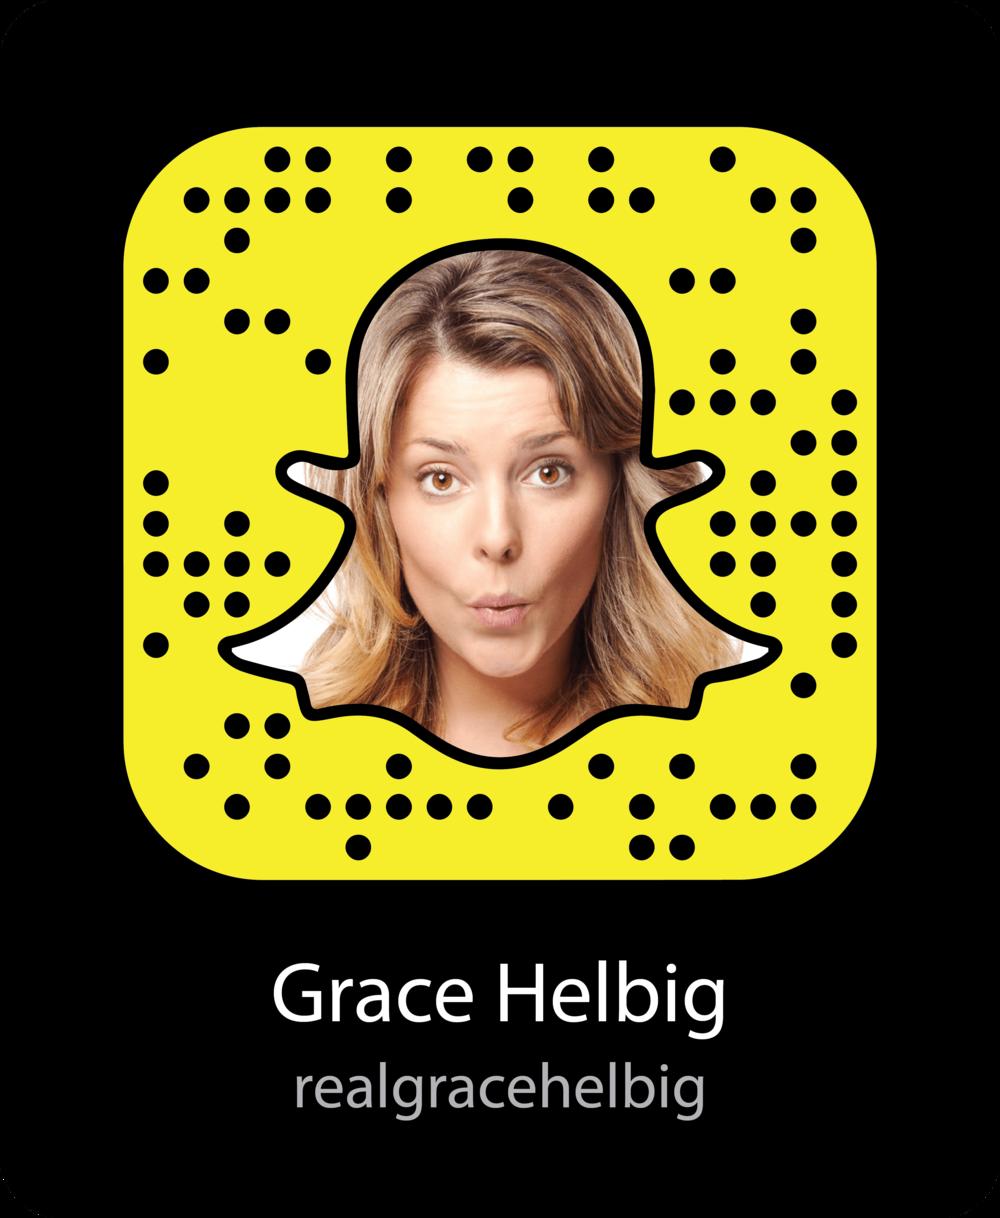 grace-helbig-vine-celebrity-snapchat-snapcode